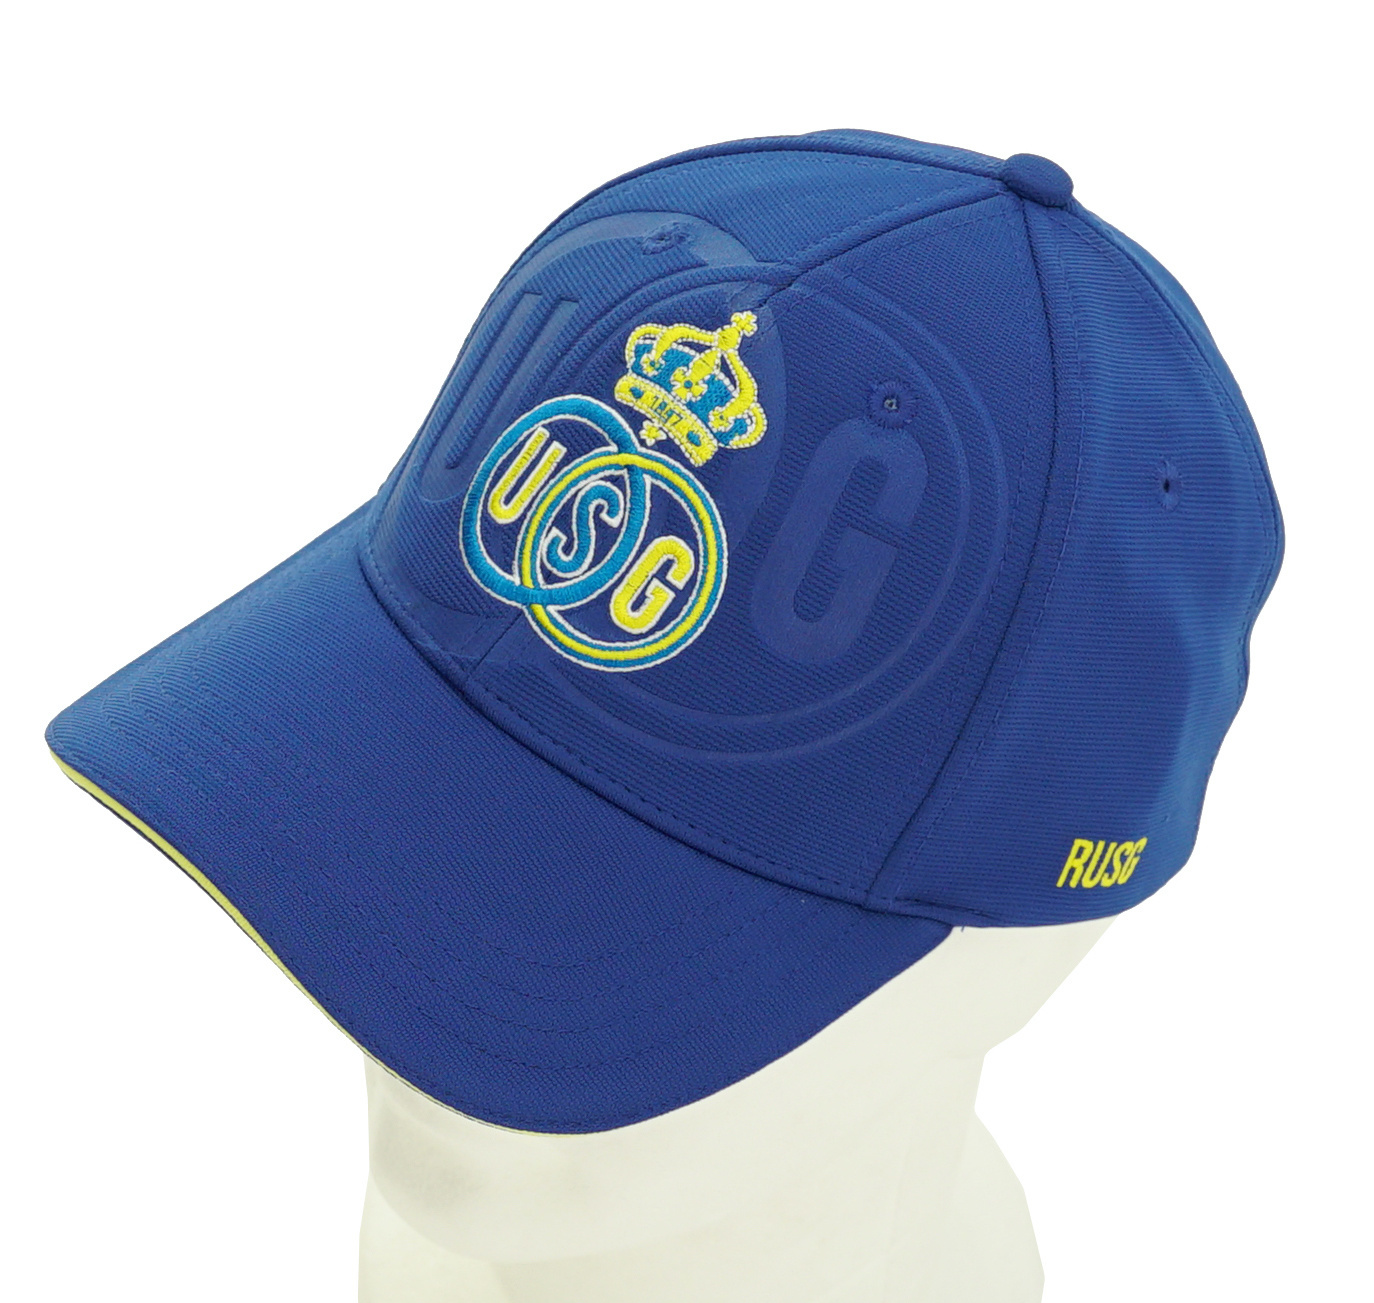 Topfanz Pet blauw embossed logo - Union